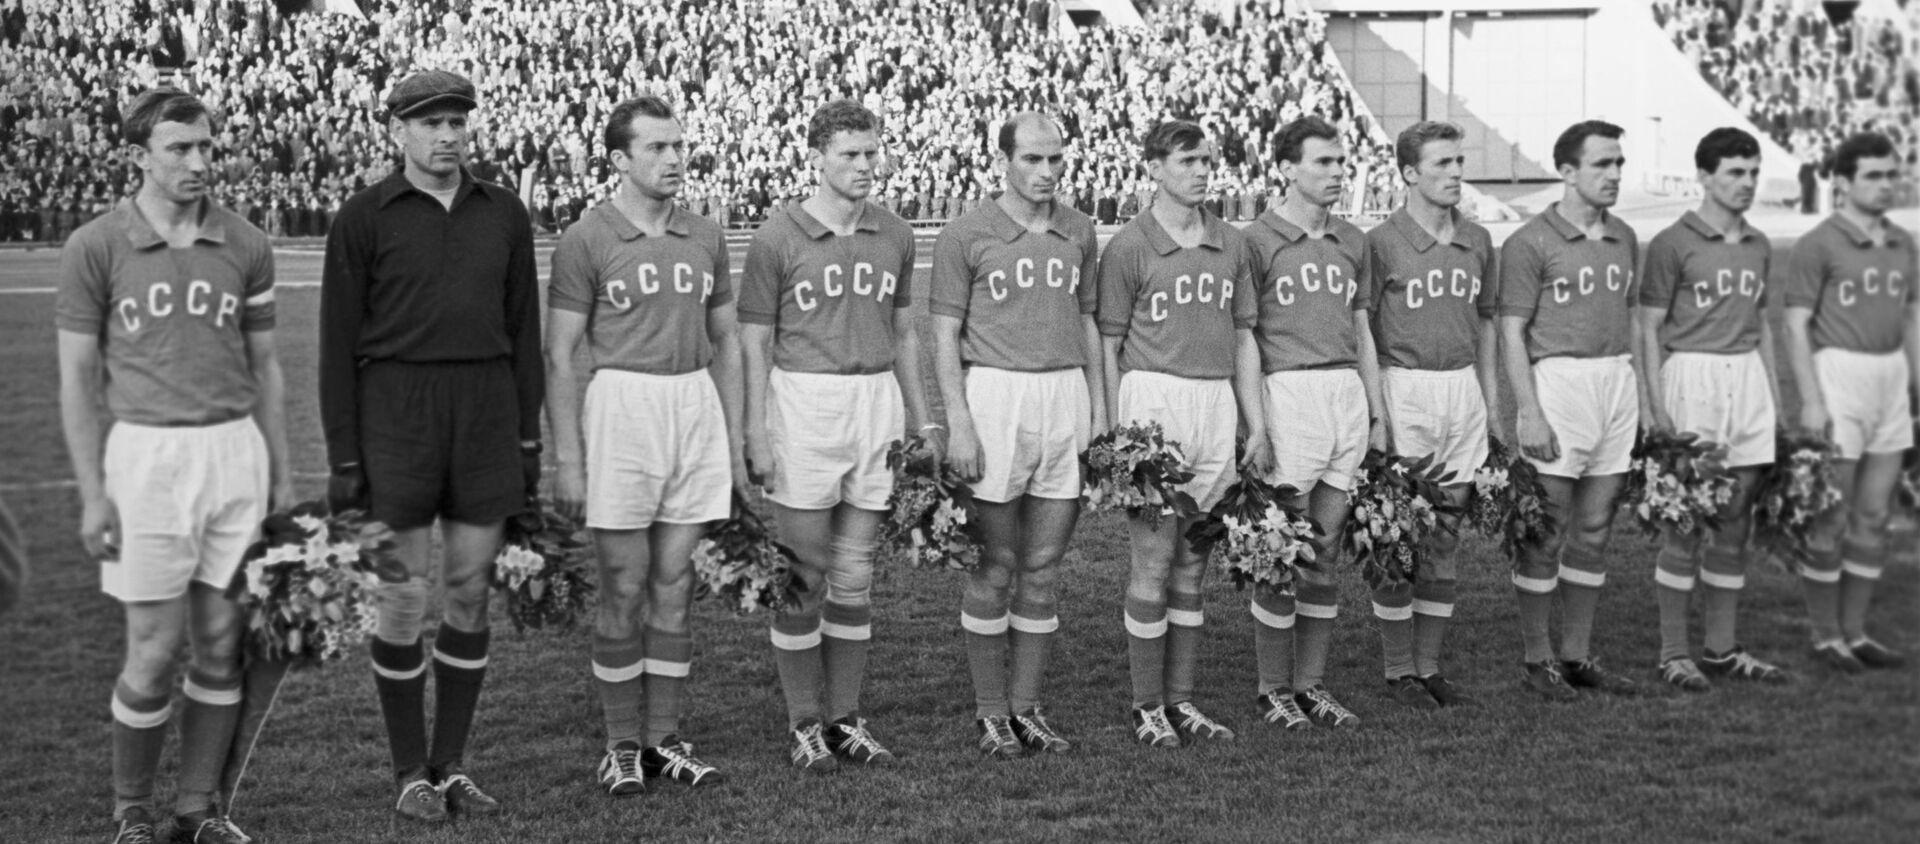 Сборная команда СССР по футболу 1960 года. - Sputnik Արմենիա, 1920, 08.02.2020